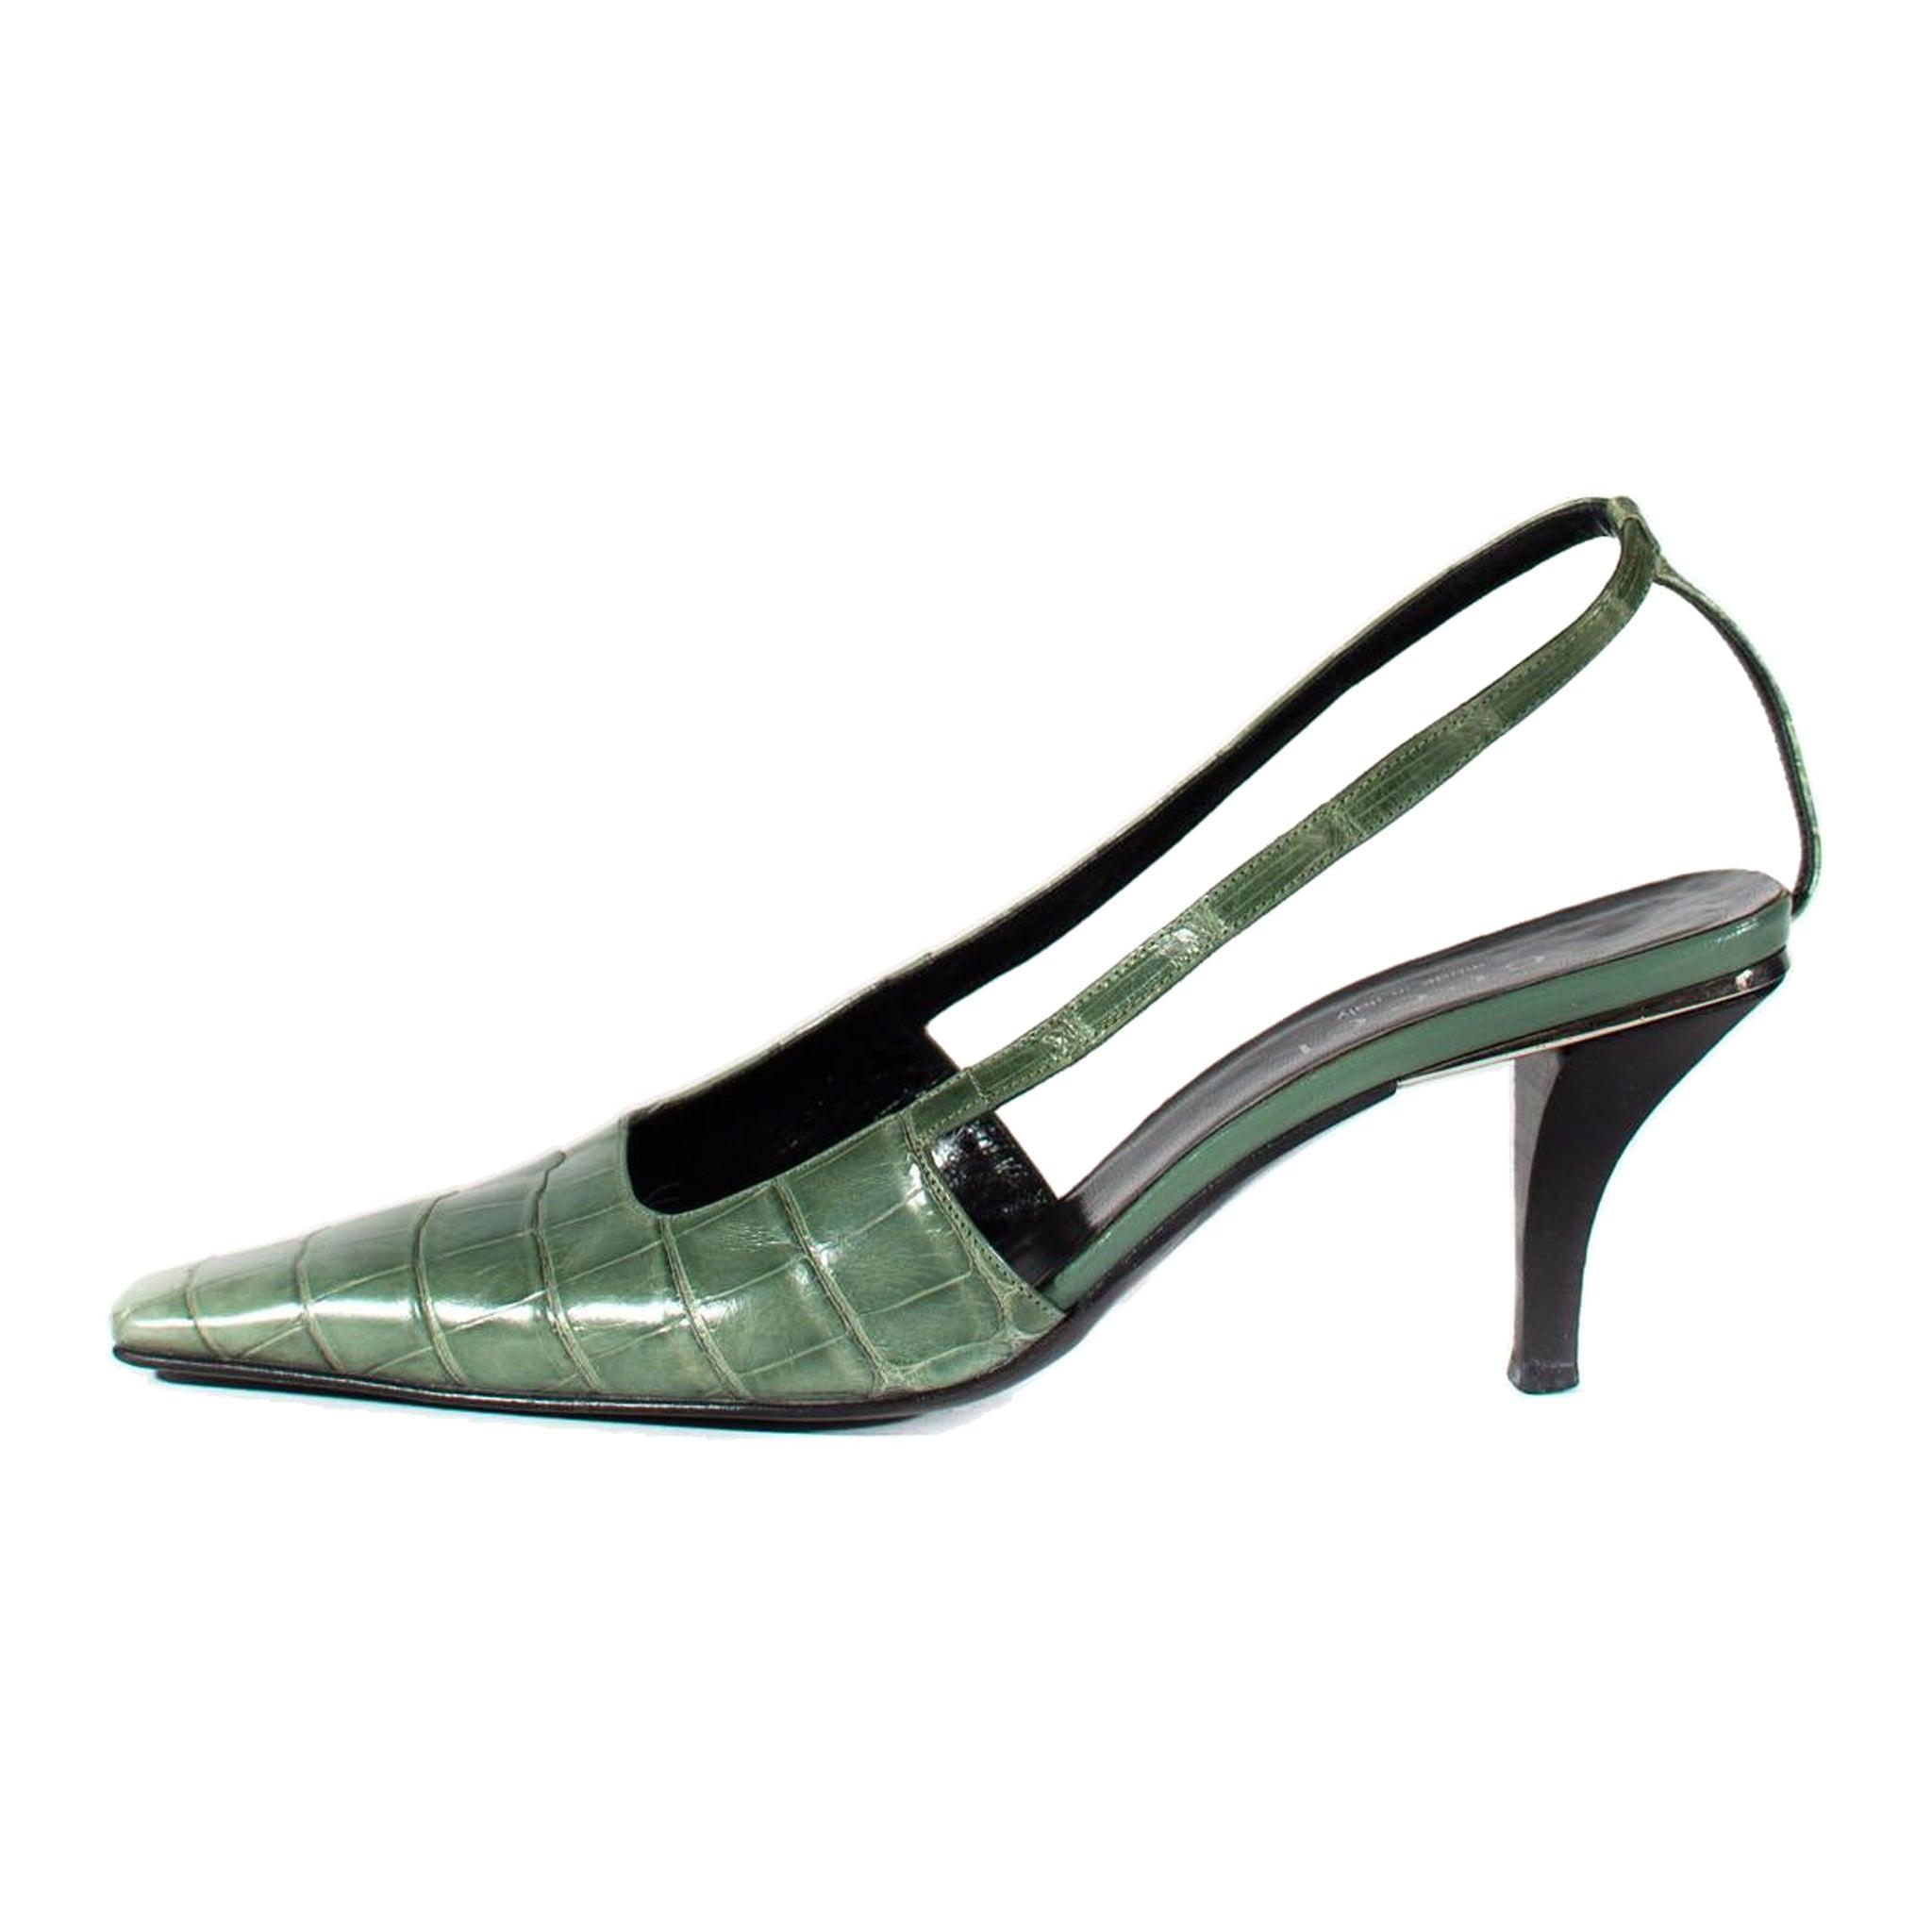 S/S 1998 Gucci by Tom Ford Light Green Alligator Kitten Heels Crystal G